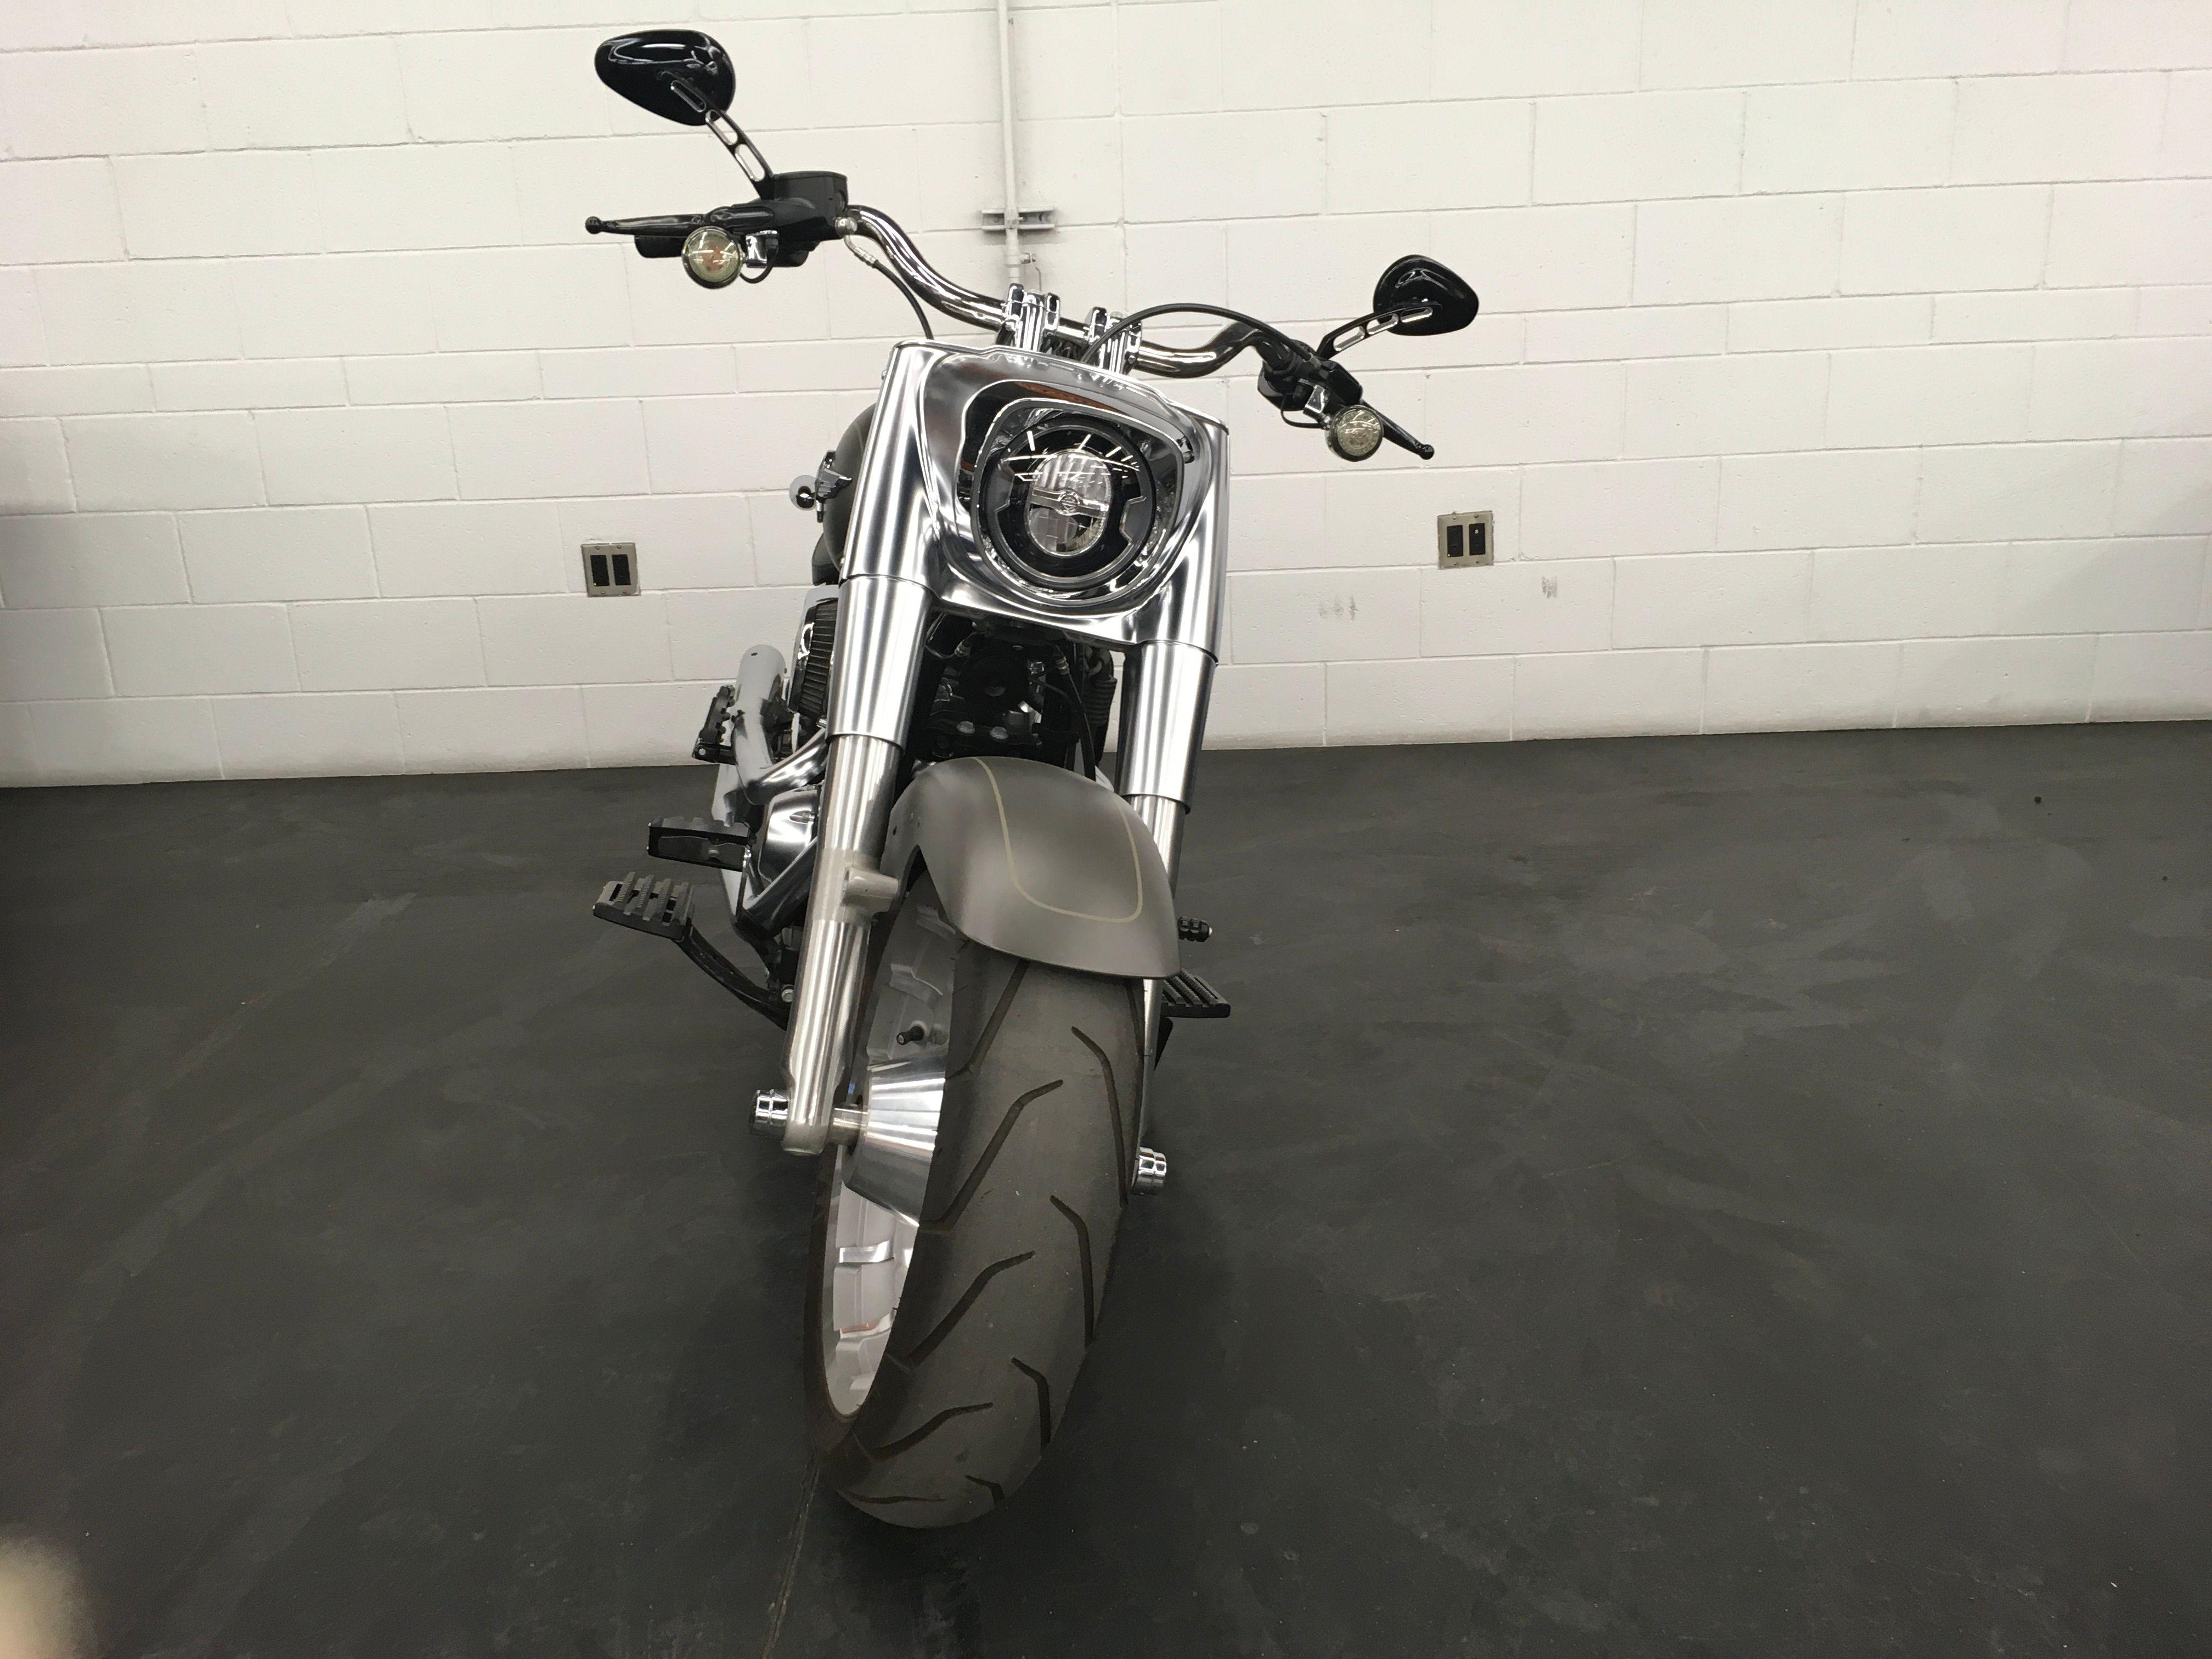 Pre-Owned 2019 Harley-Davidson Fat Boy 114